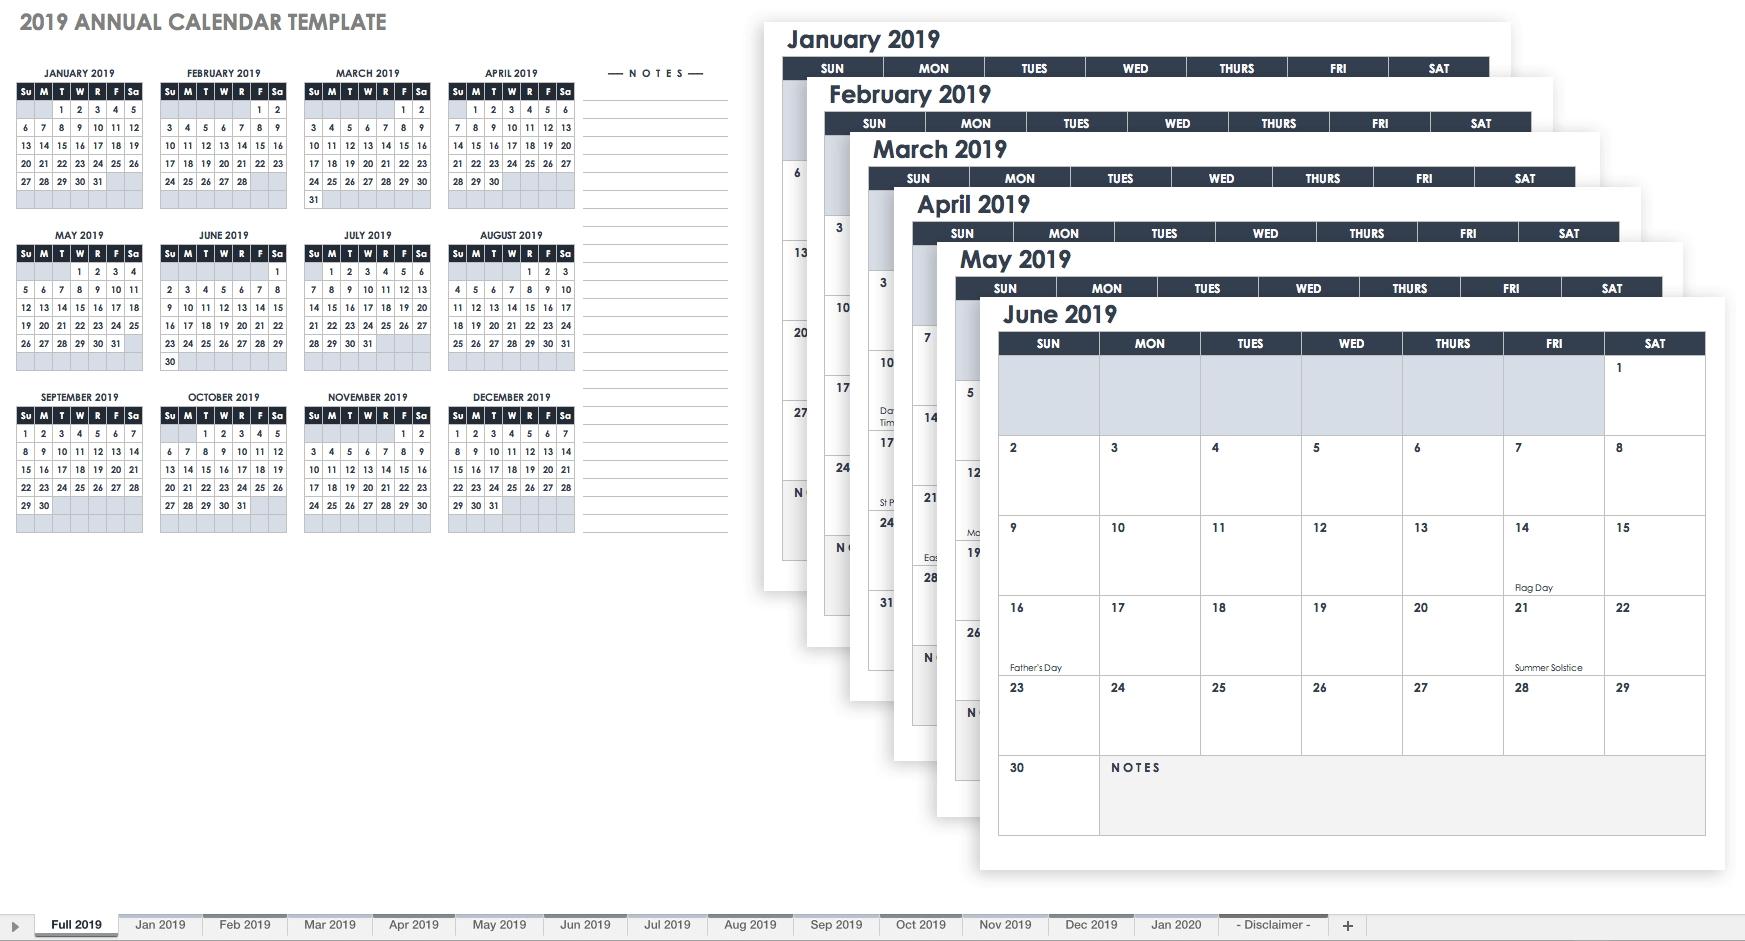 15 Free Monthly Calendar Templates | Smartsheet in Google Annual Calendar 2019-2020